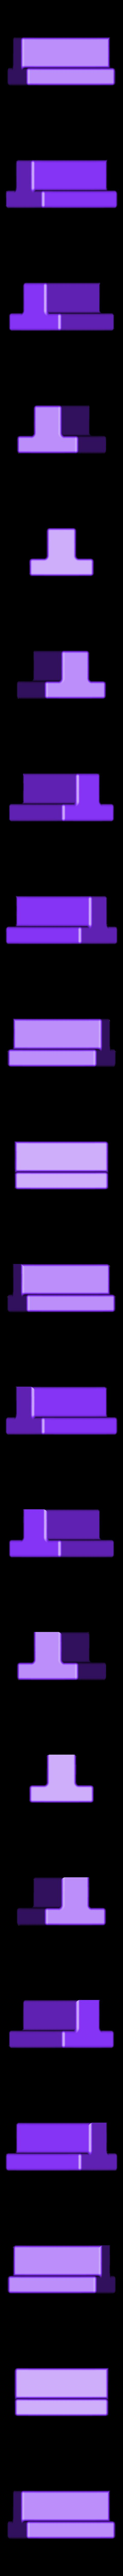 slide.stl Download free STL file Trammel of Archimedes • 3D printing template, mtairymd